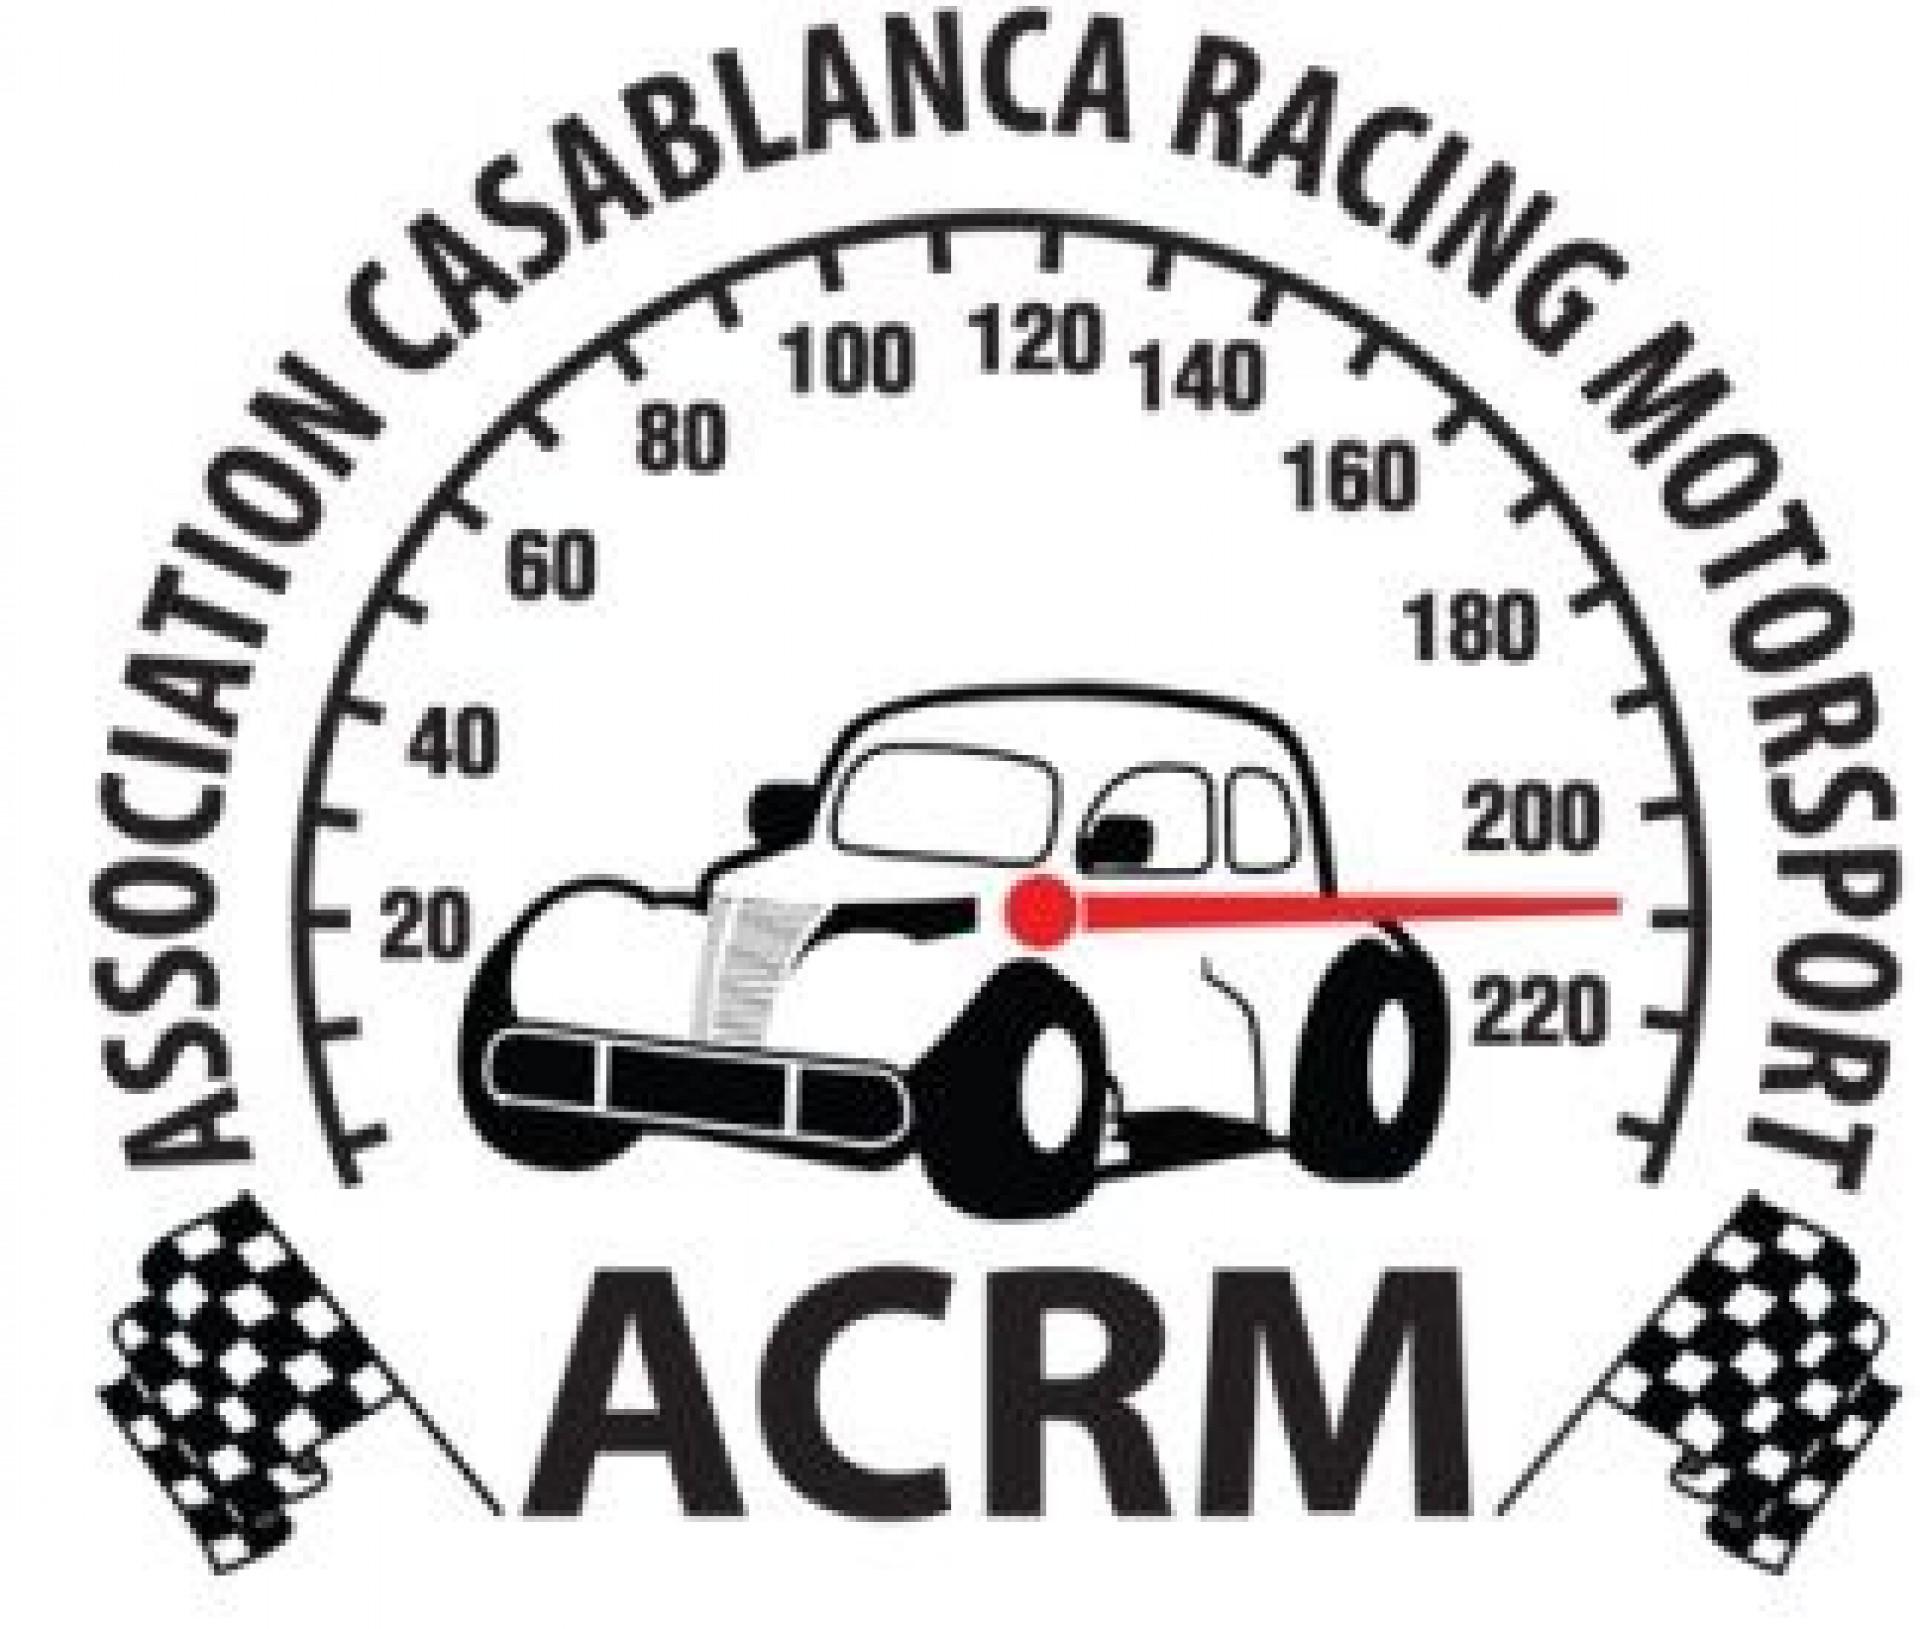 Association Casablanca Racing Motorsport (ACRM) logo